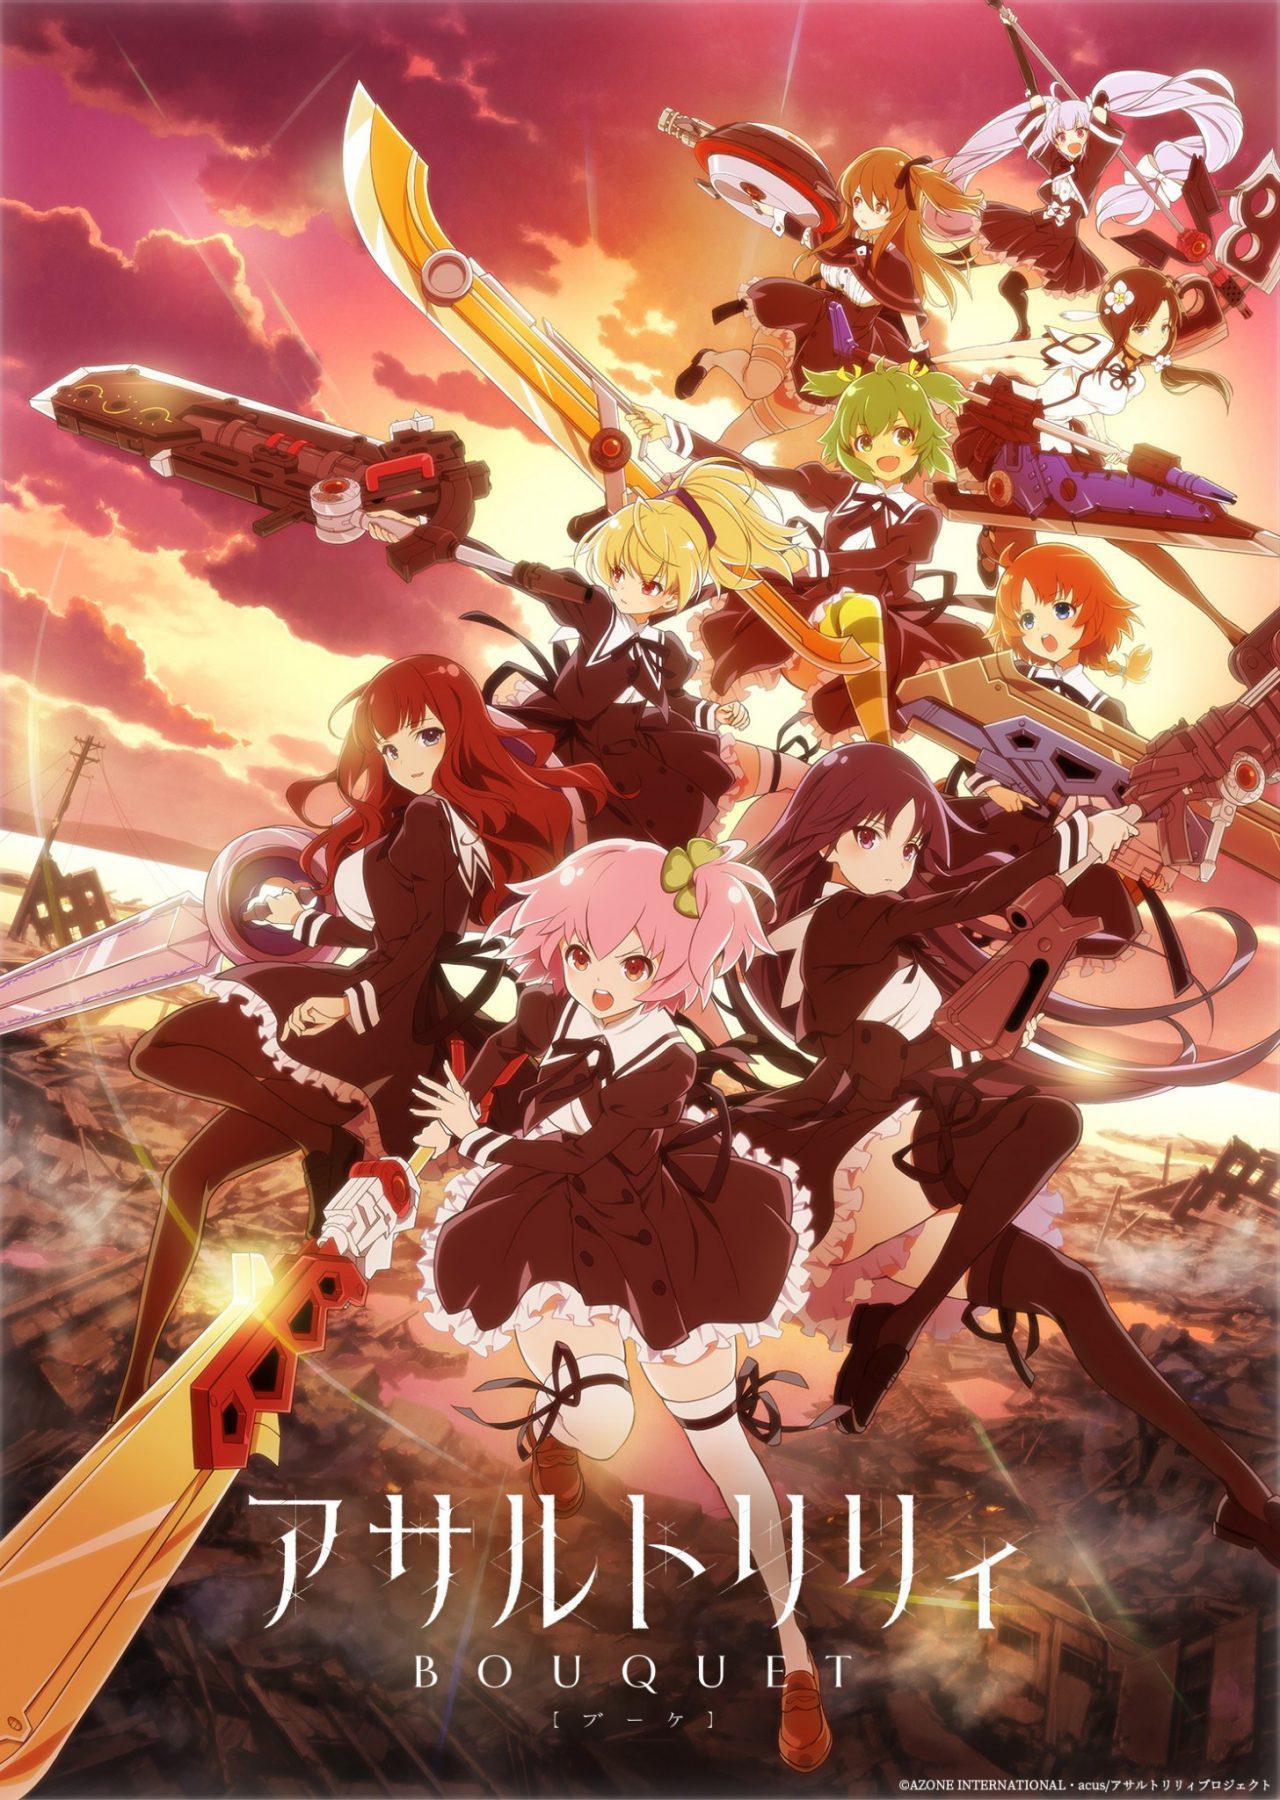 TVアニメ『アサルトリリィ BOUQUET』10月29日(木)放送の第5話限定カットが公開!